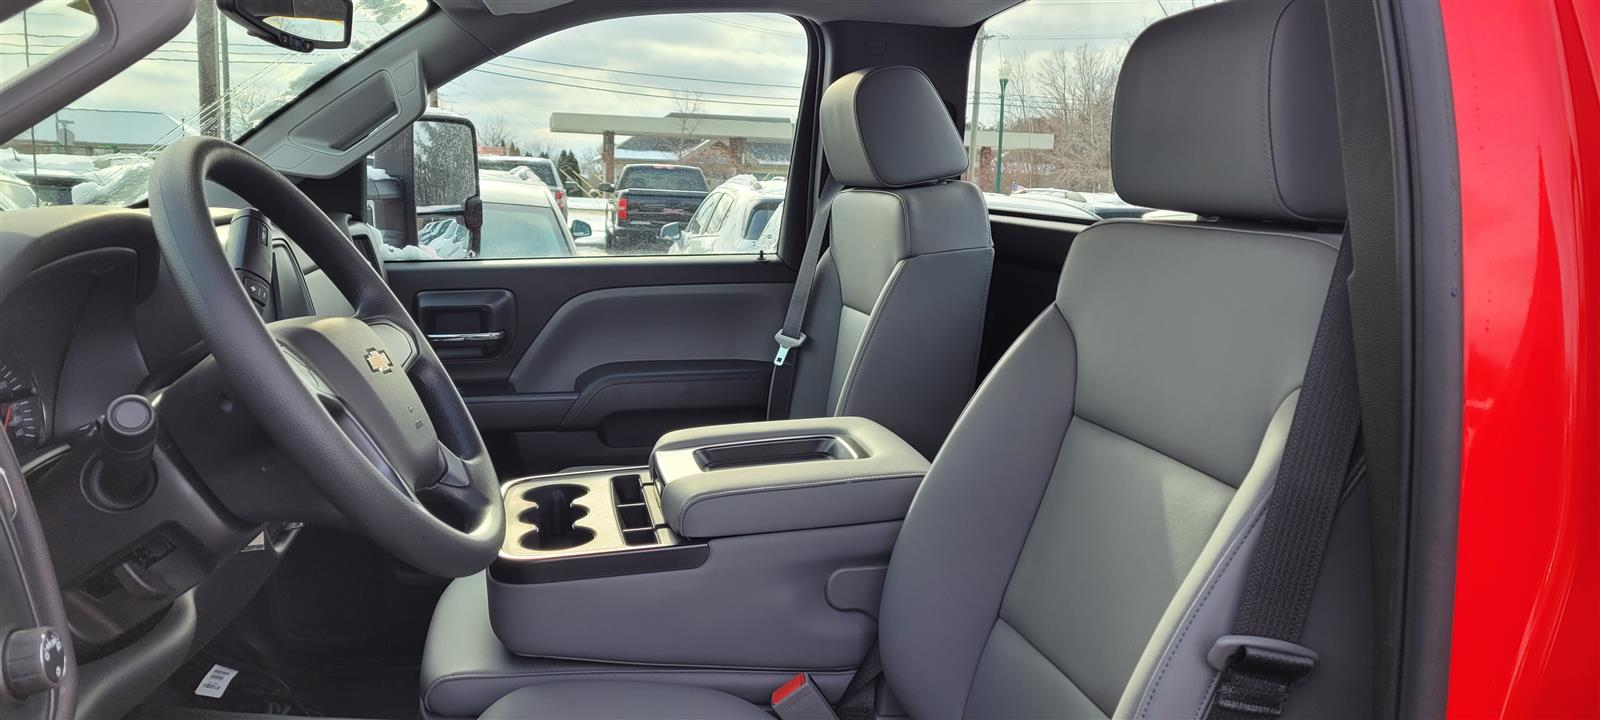 2021 Silverado 6500 Regular Cab DRW 4x2,  Cab Chassis #21CC730 - photo 5